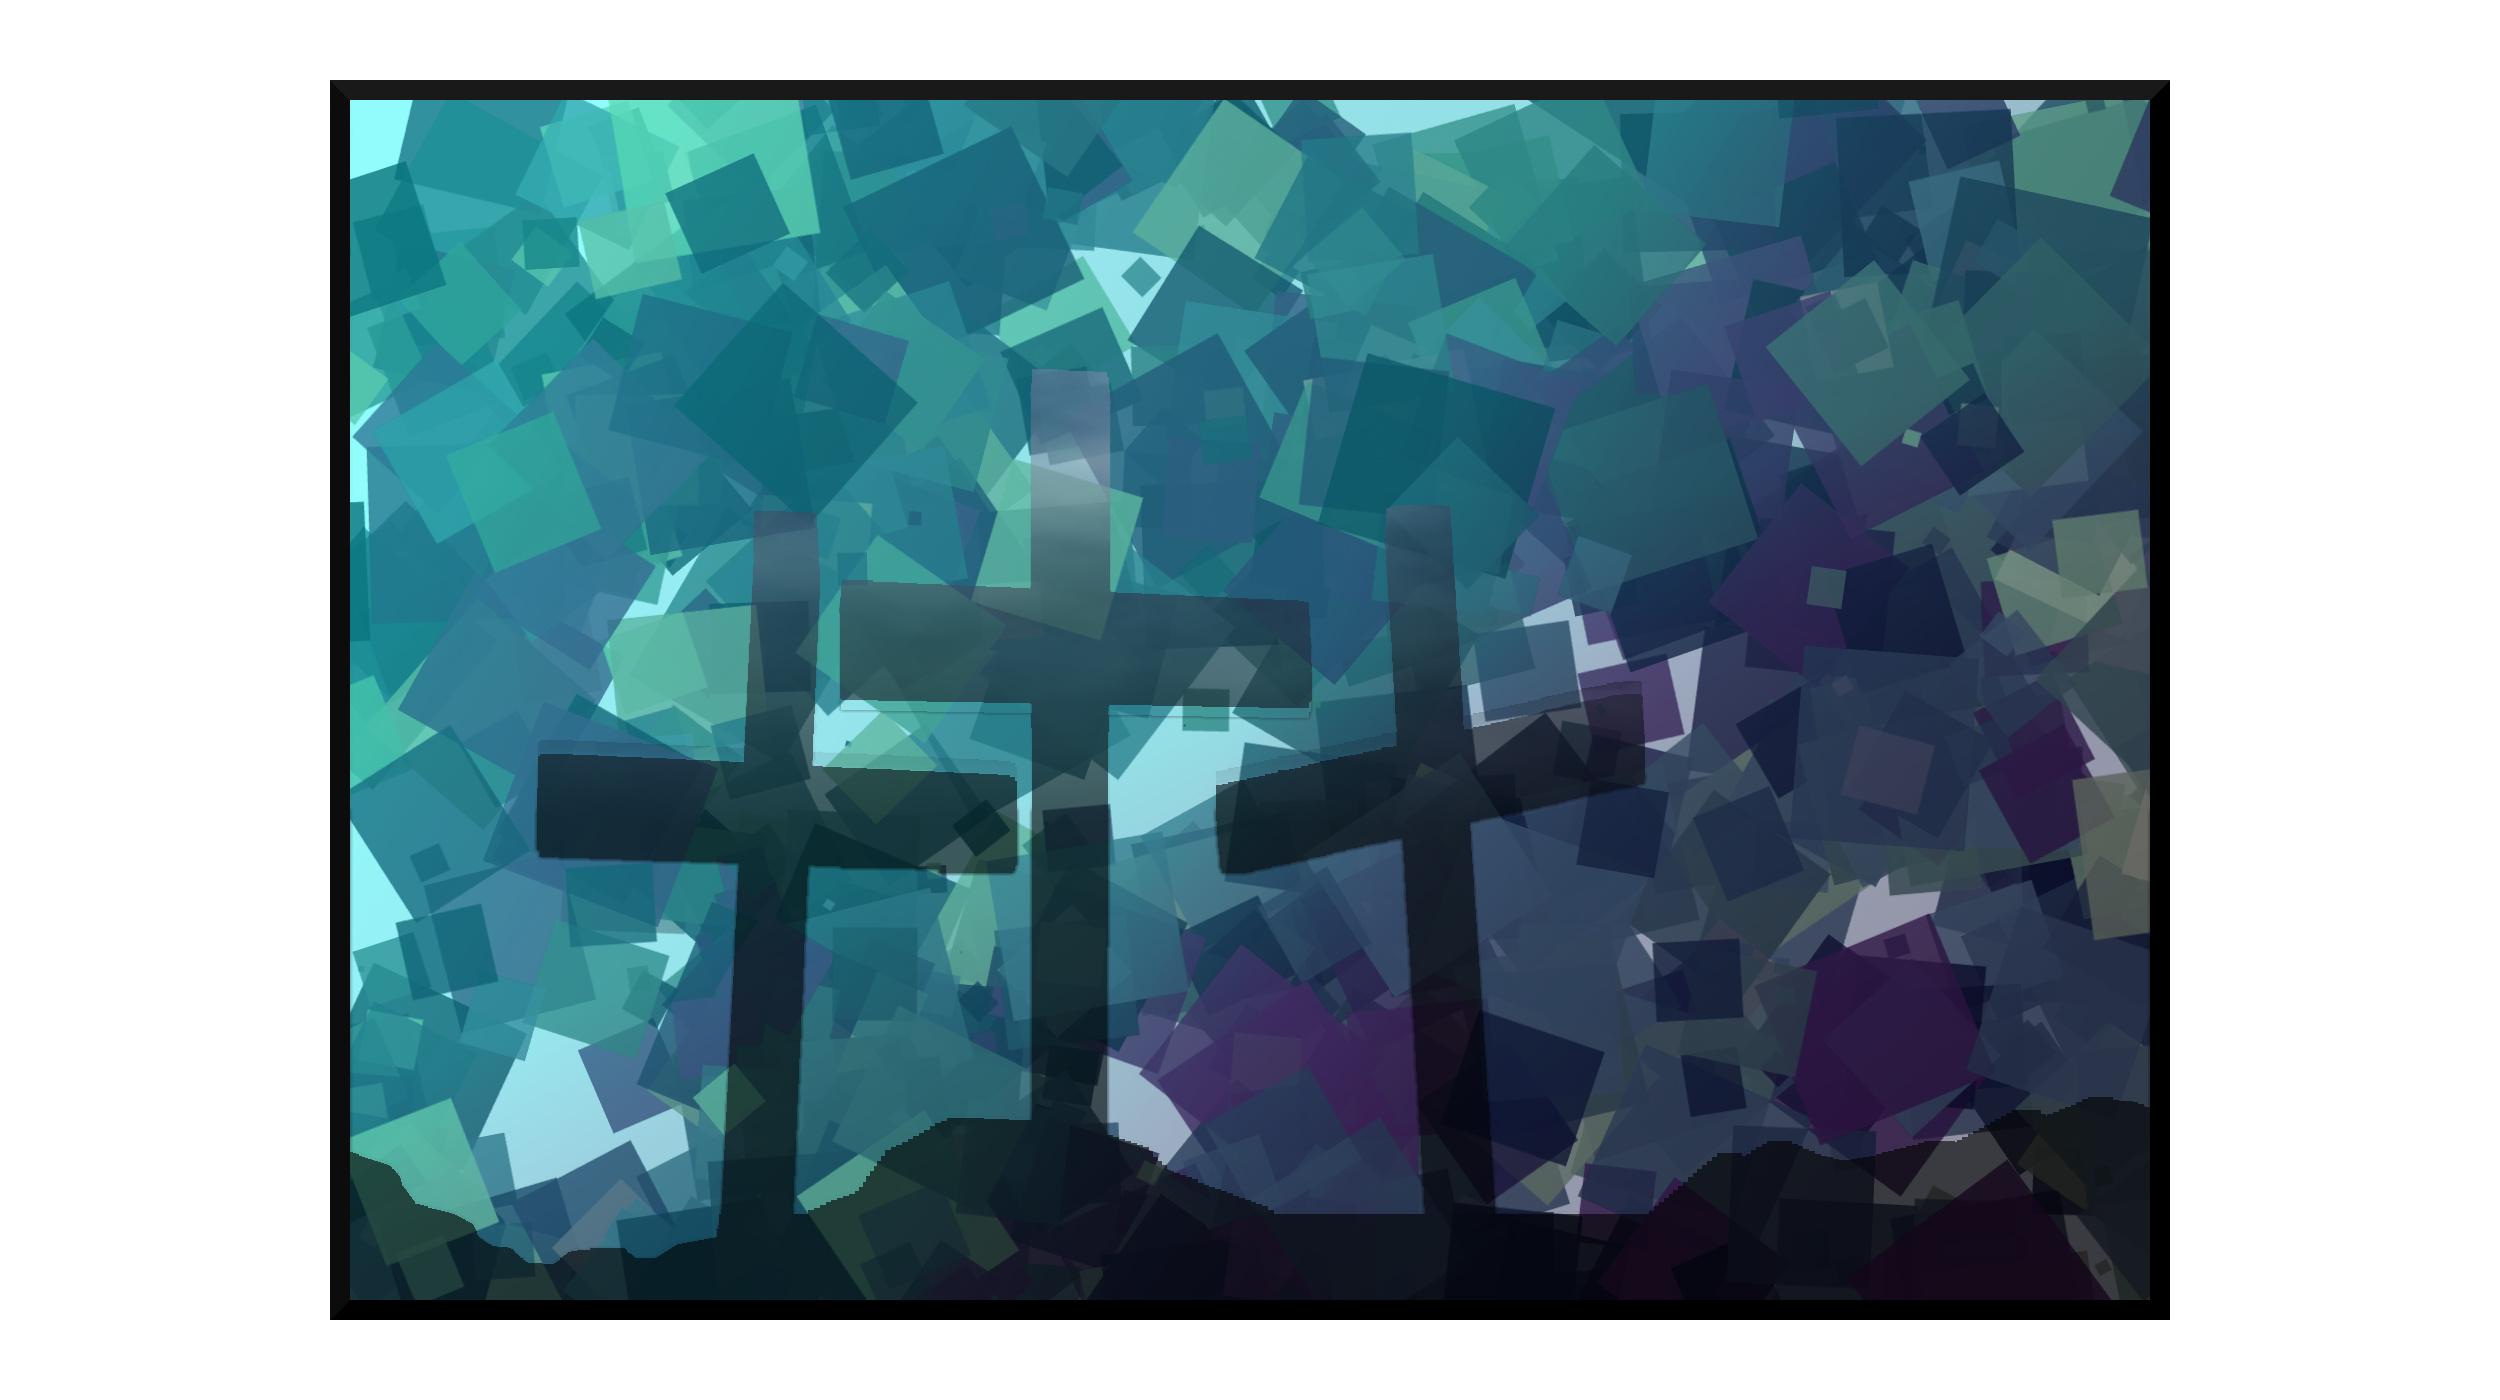 Illustration: shadows of crosses against a rainstorm